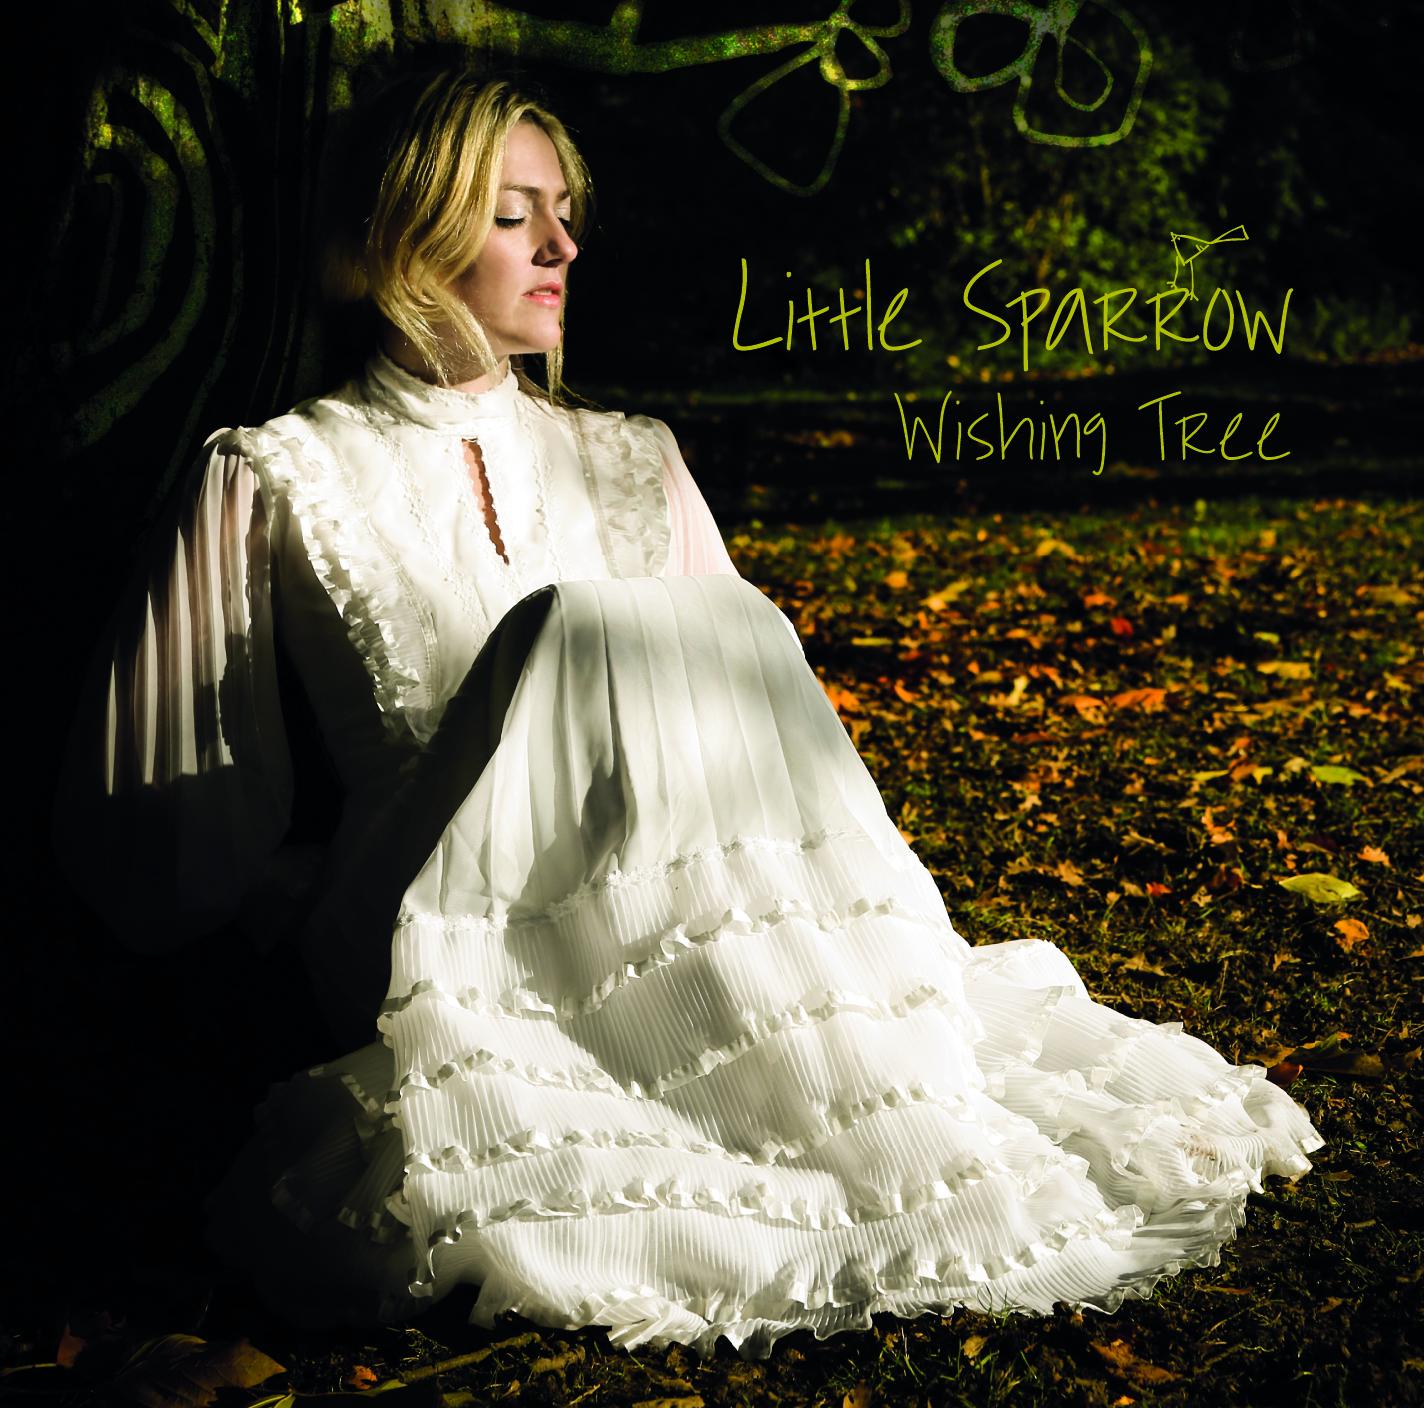 Little Sparrow: Wishing Tree – album review